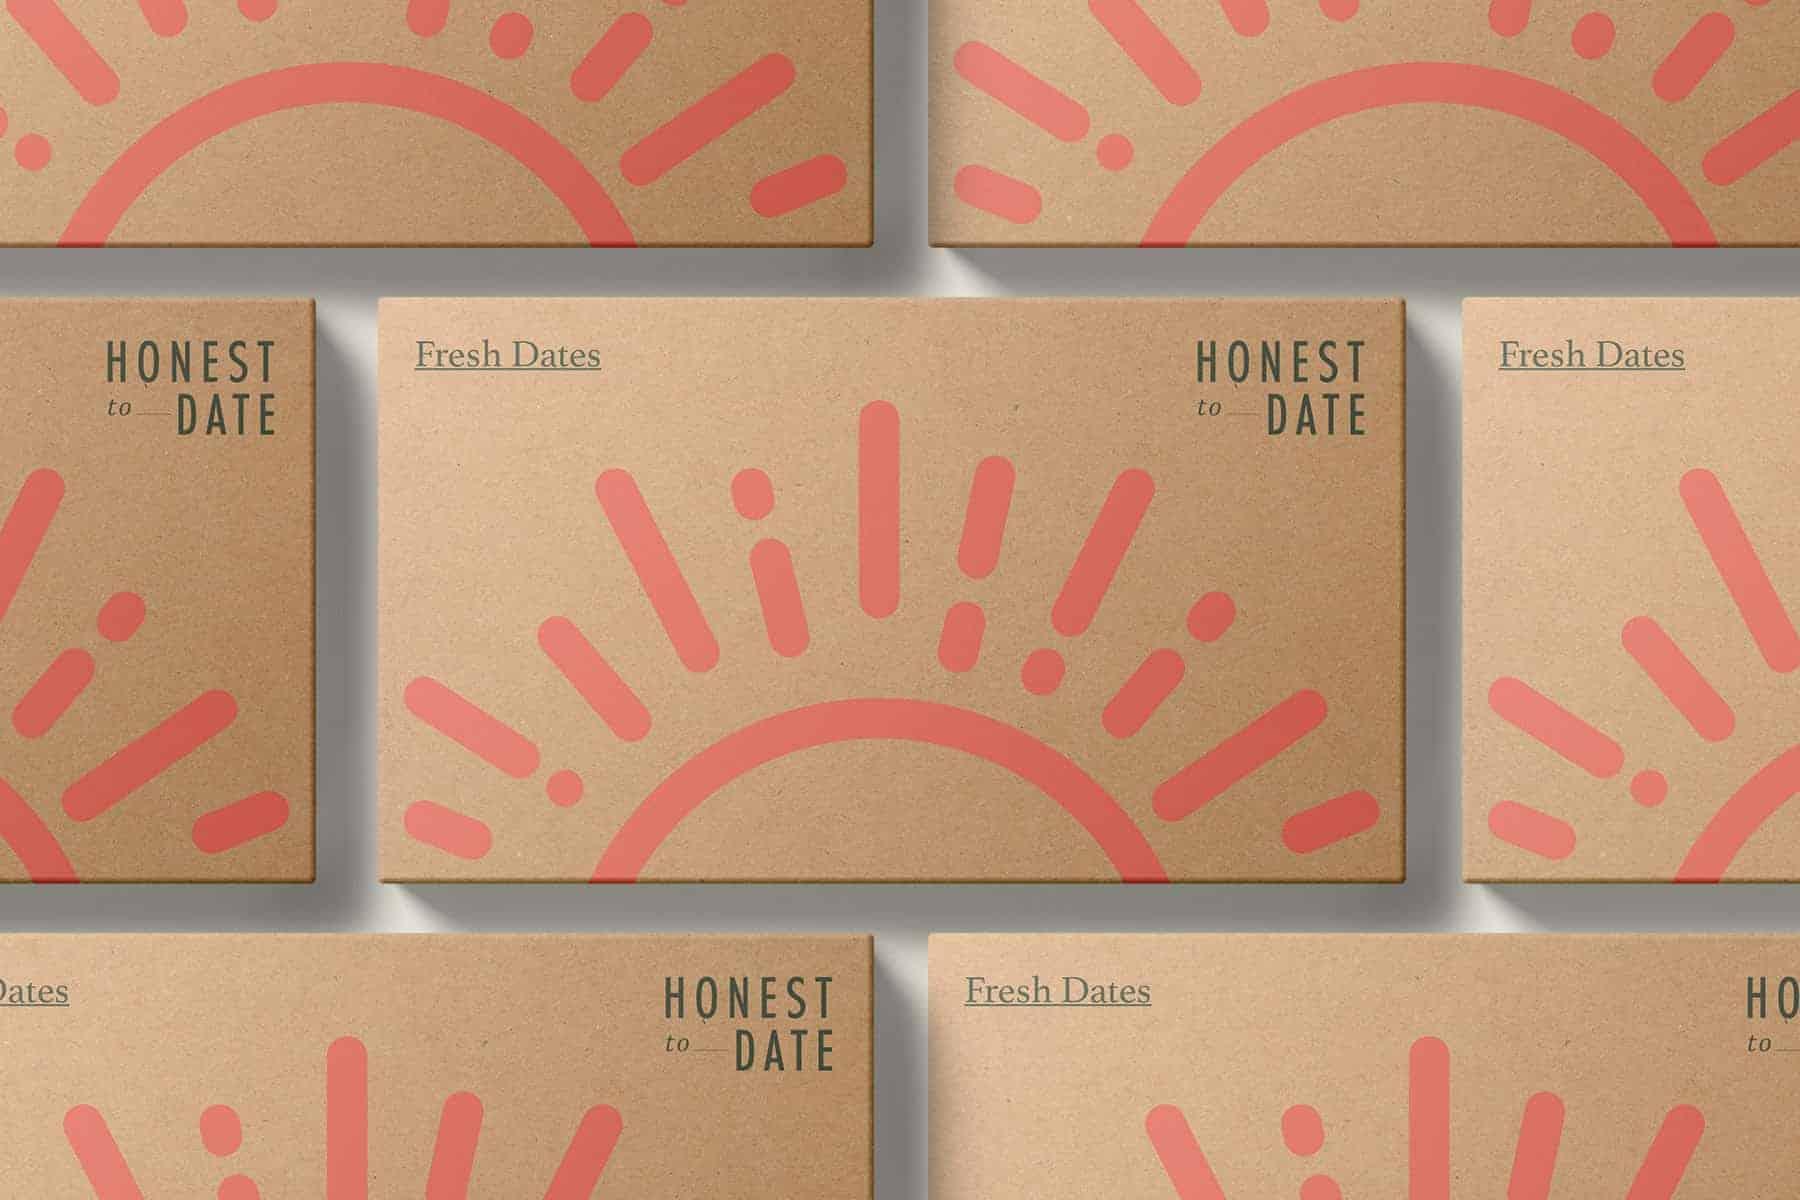 Honest To Date